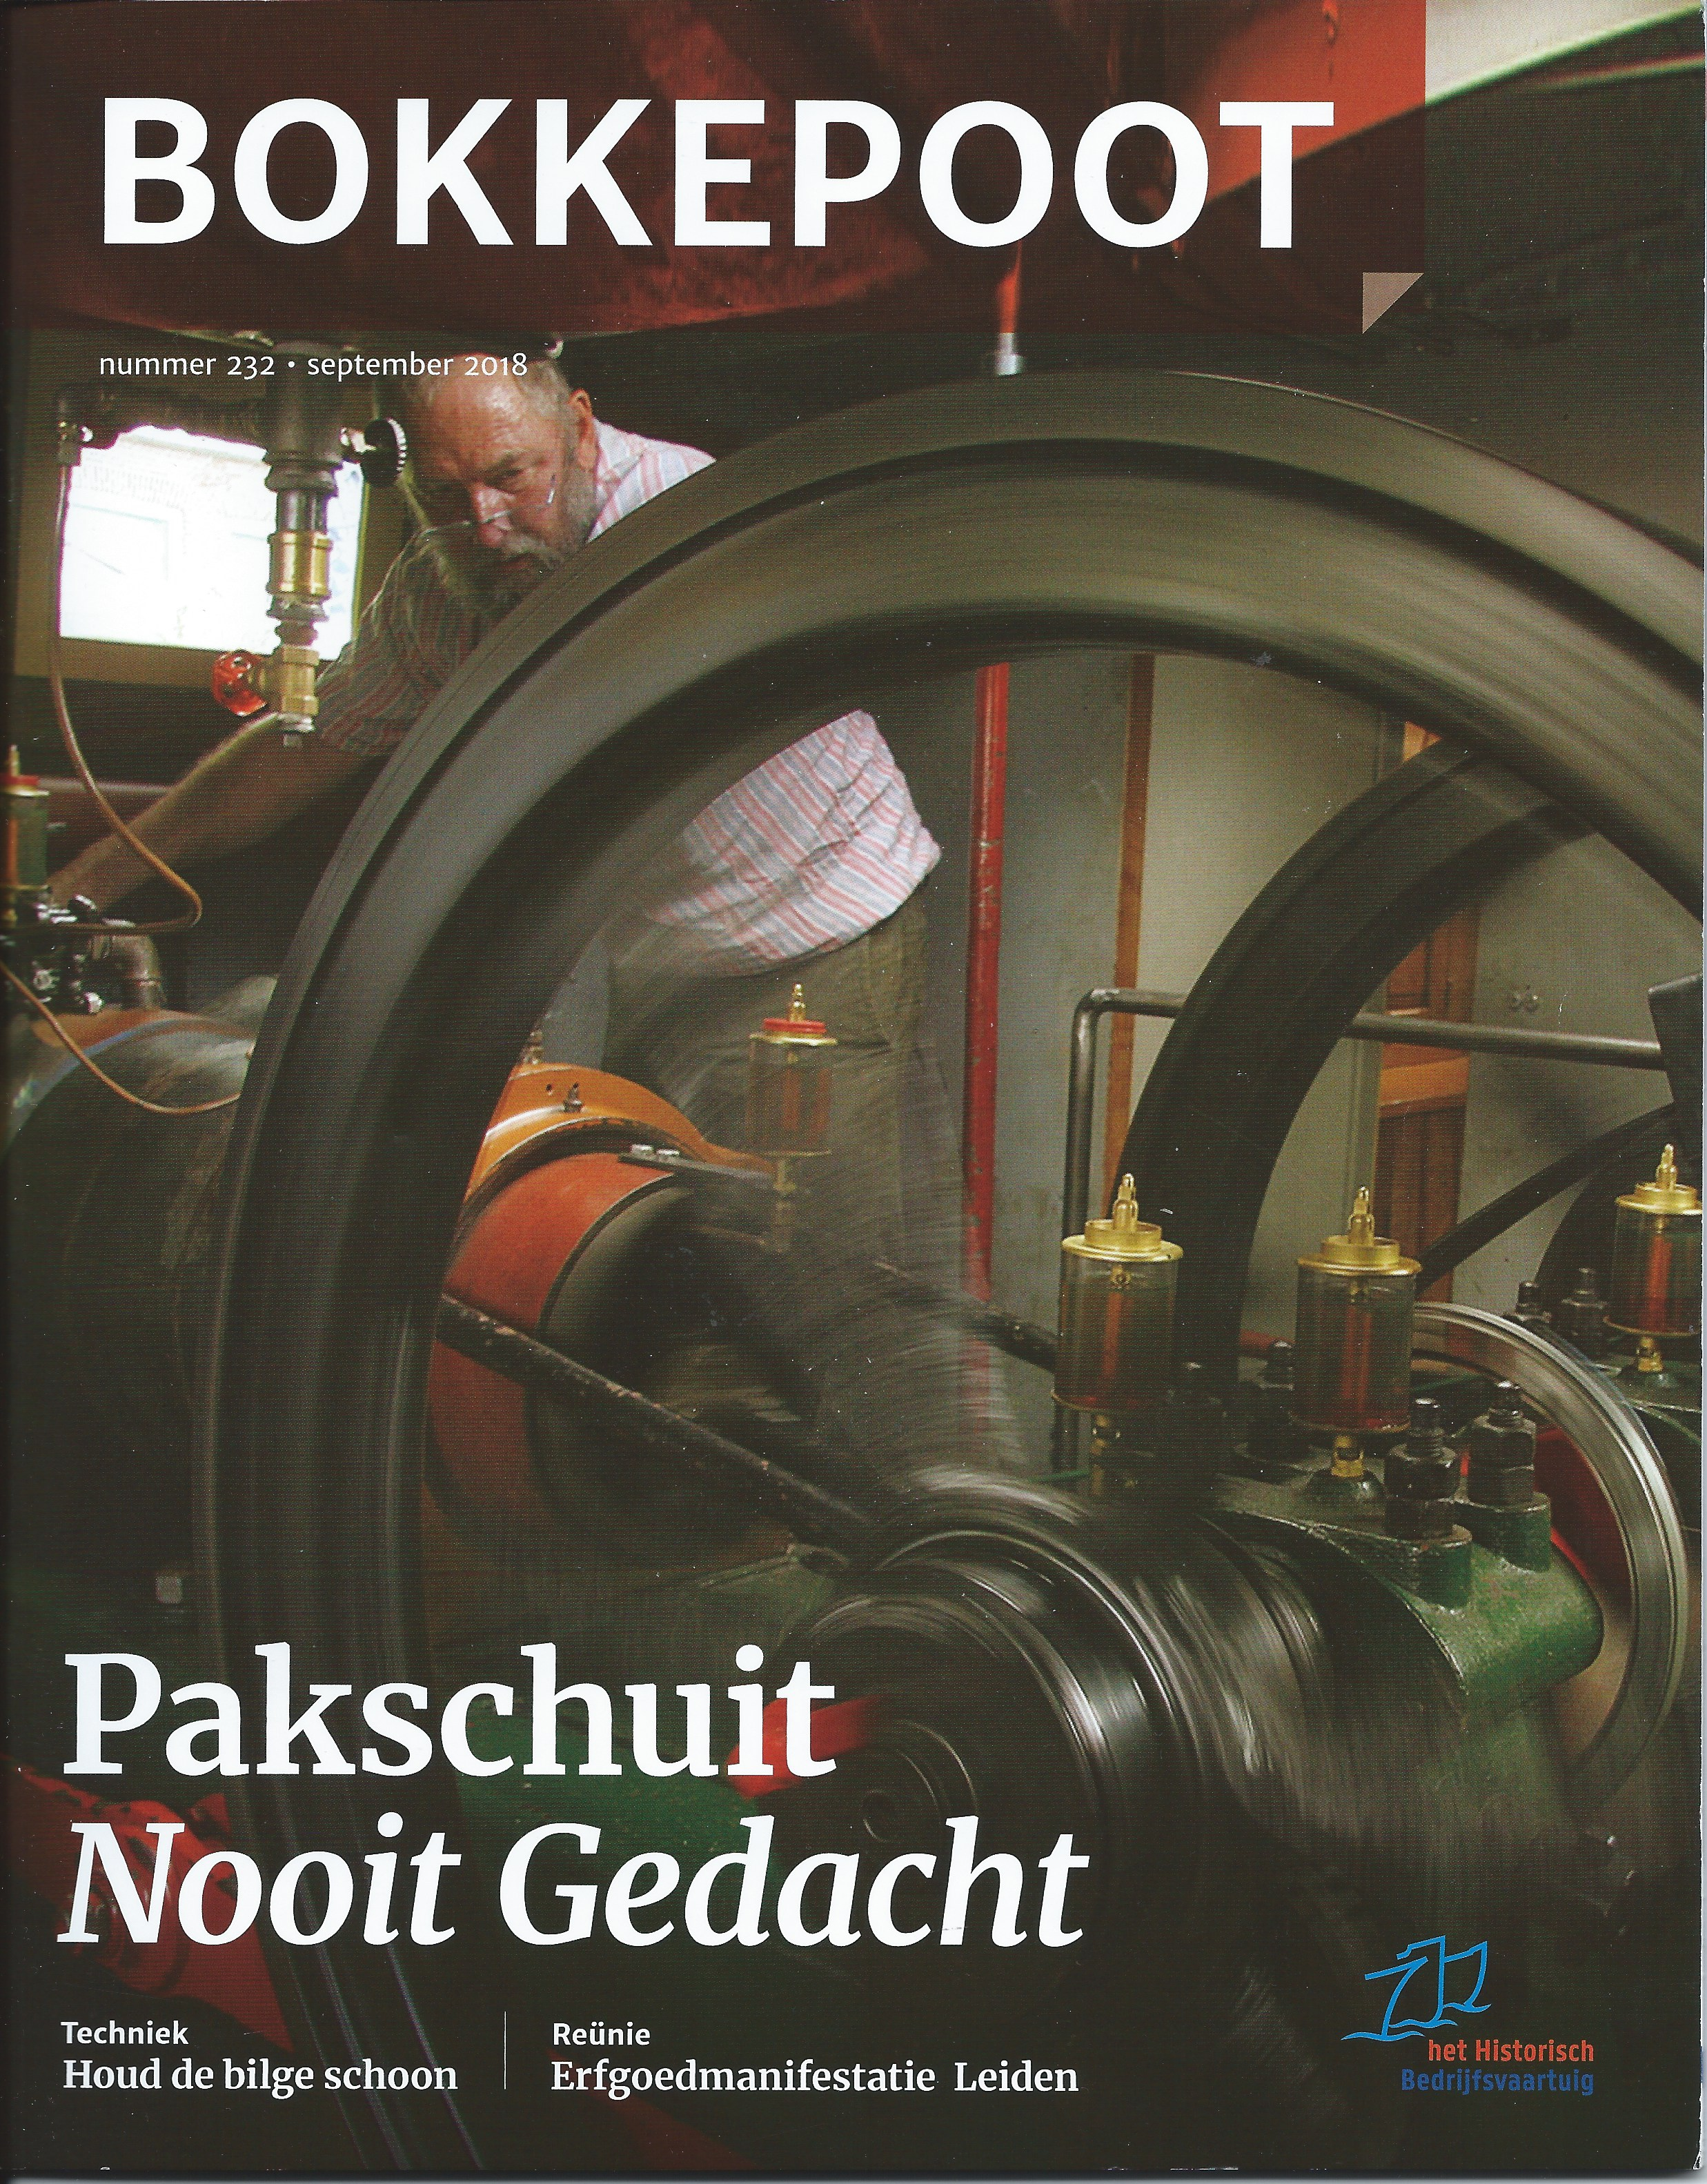 Peter Beckmann en Van Rennes-motor op het omslag van Bokkepoot